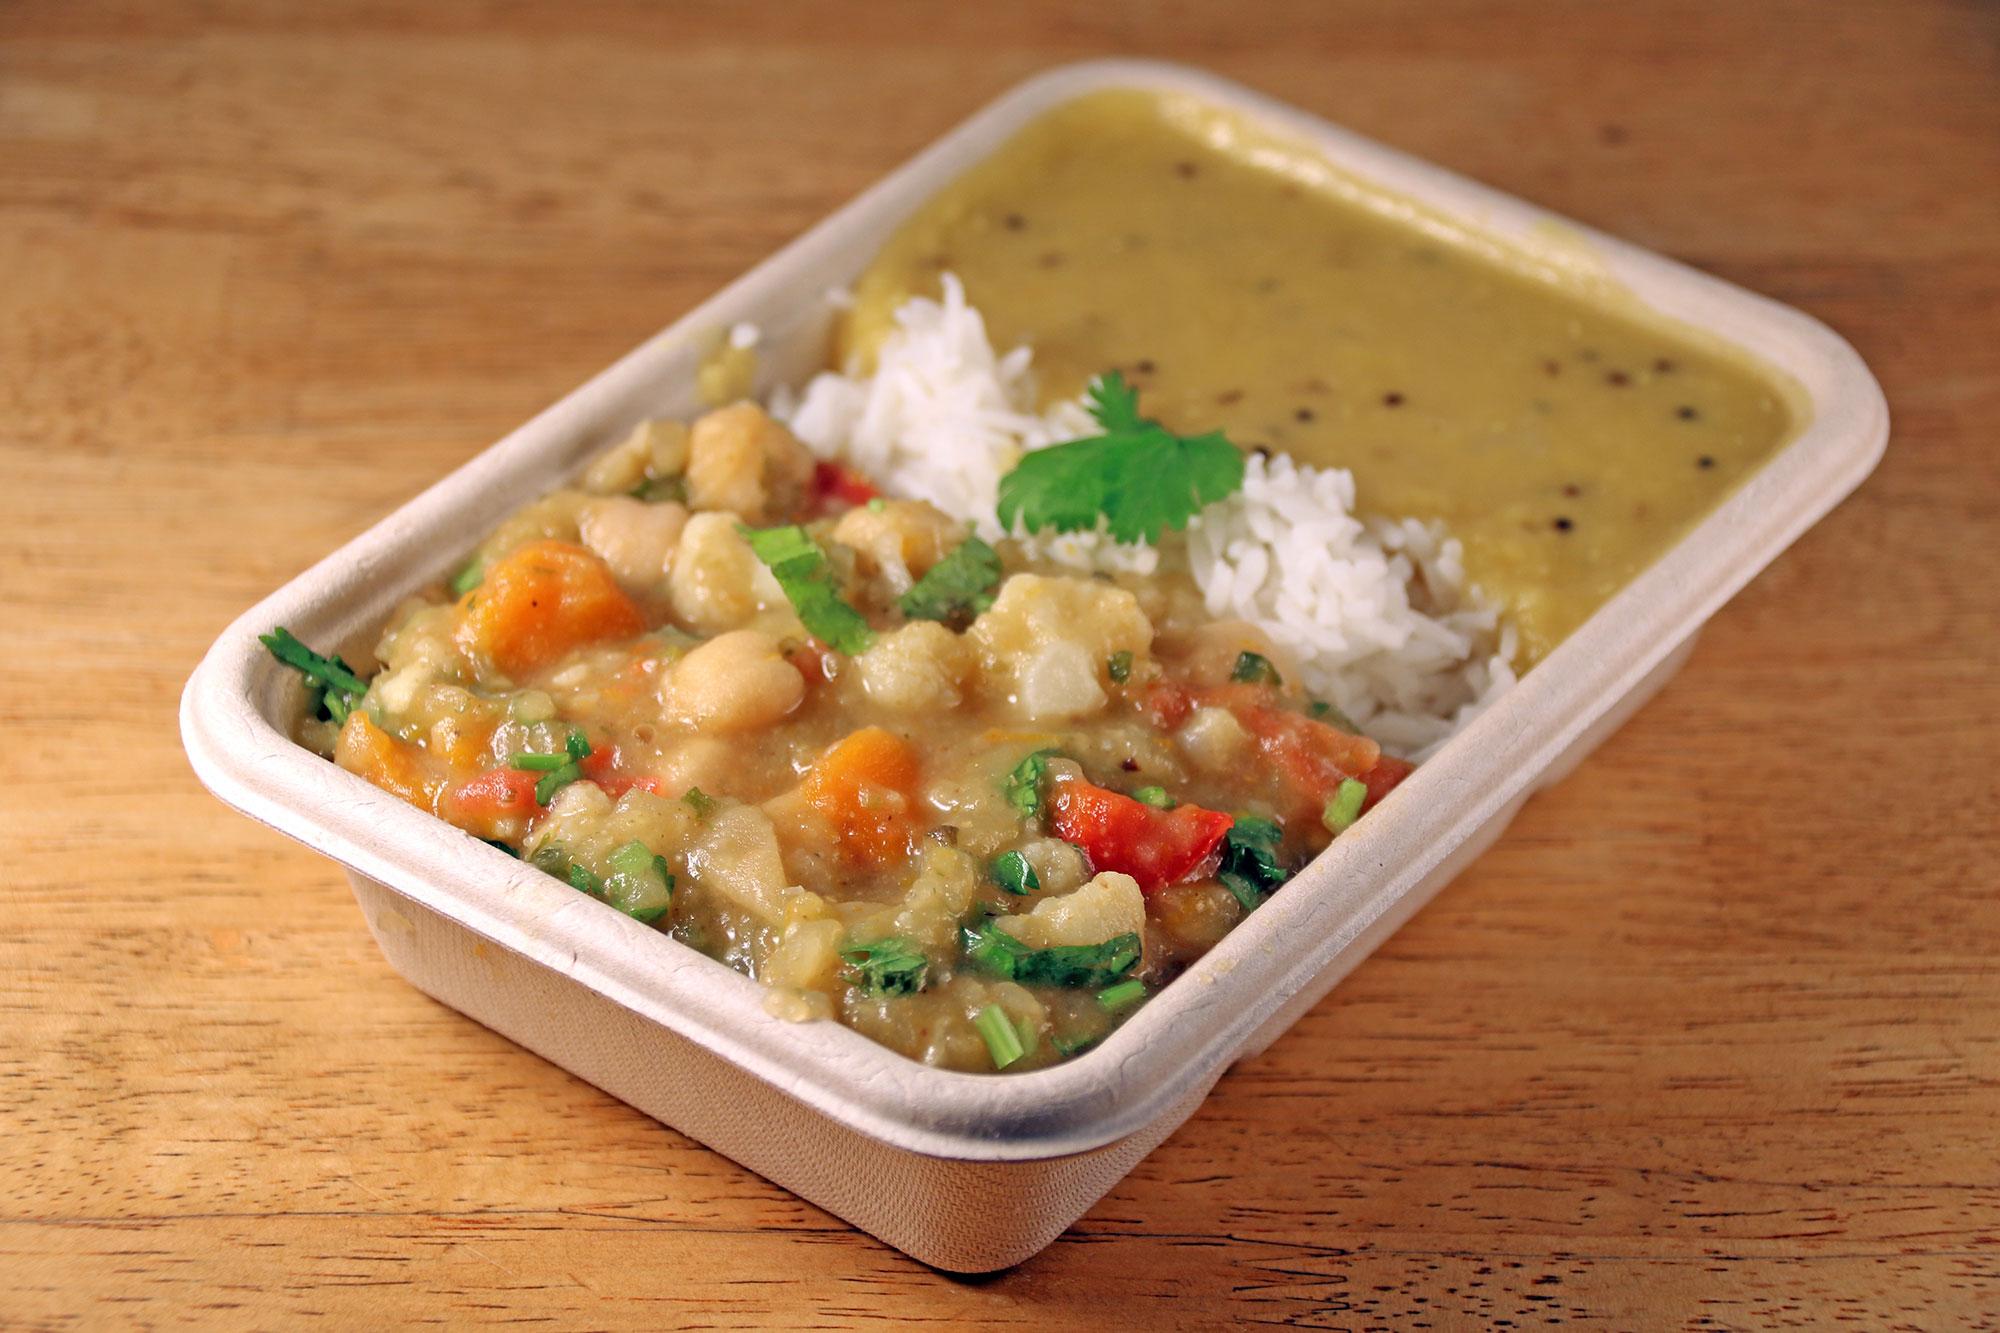 Chickpea & pumpkin curry